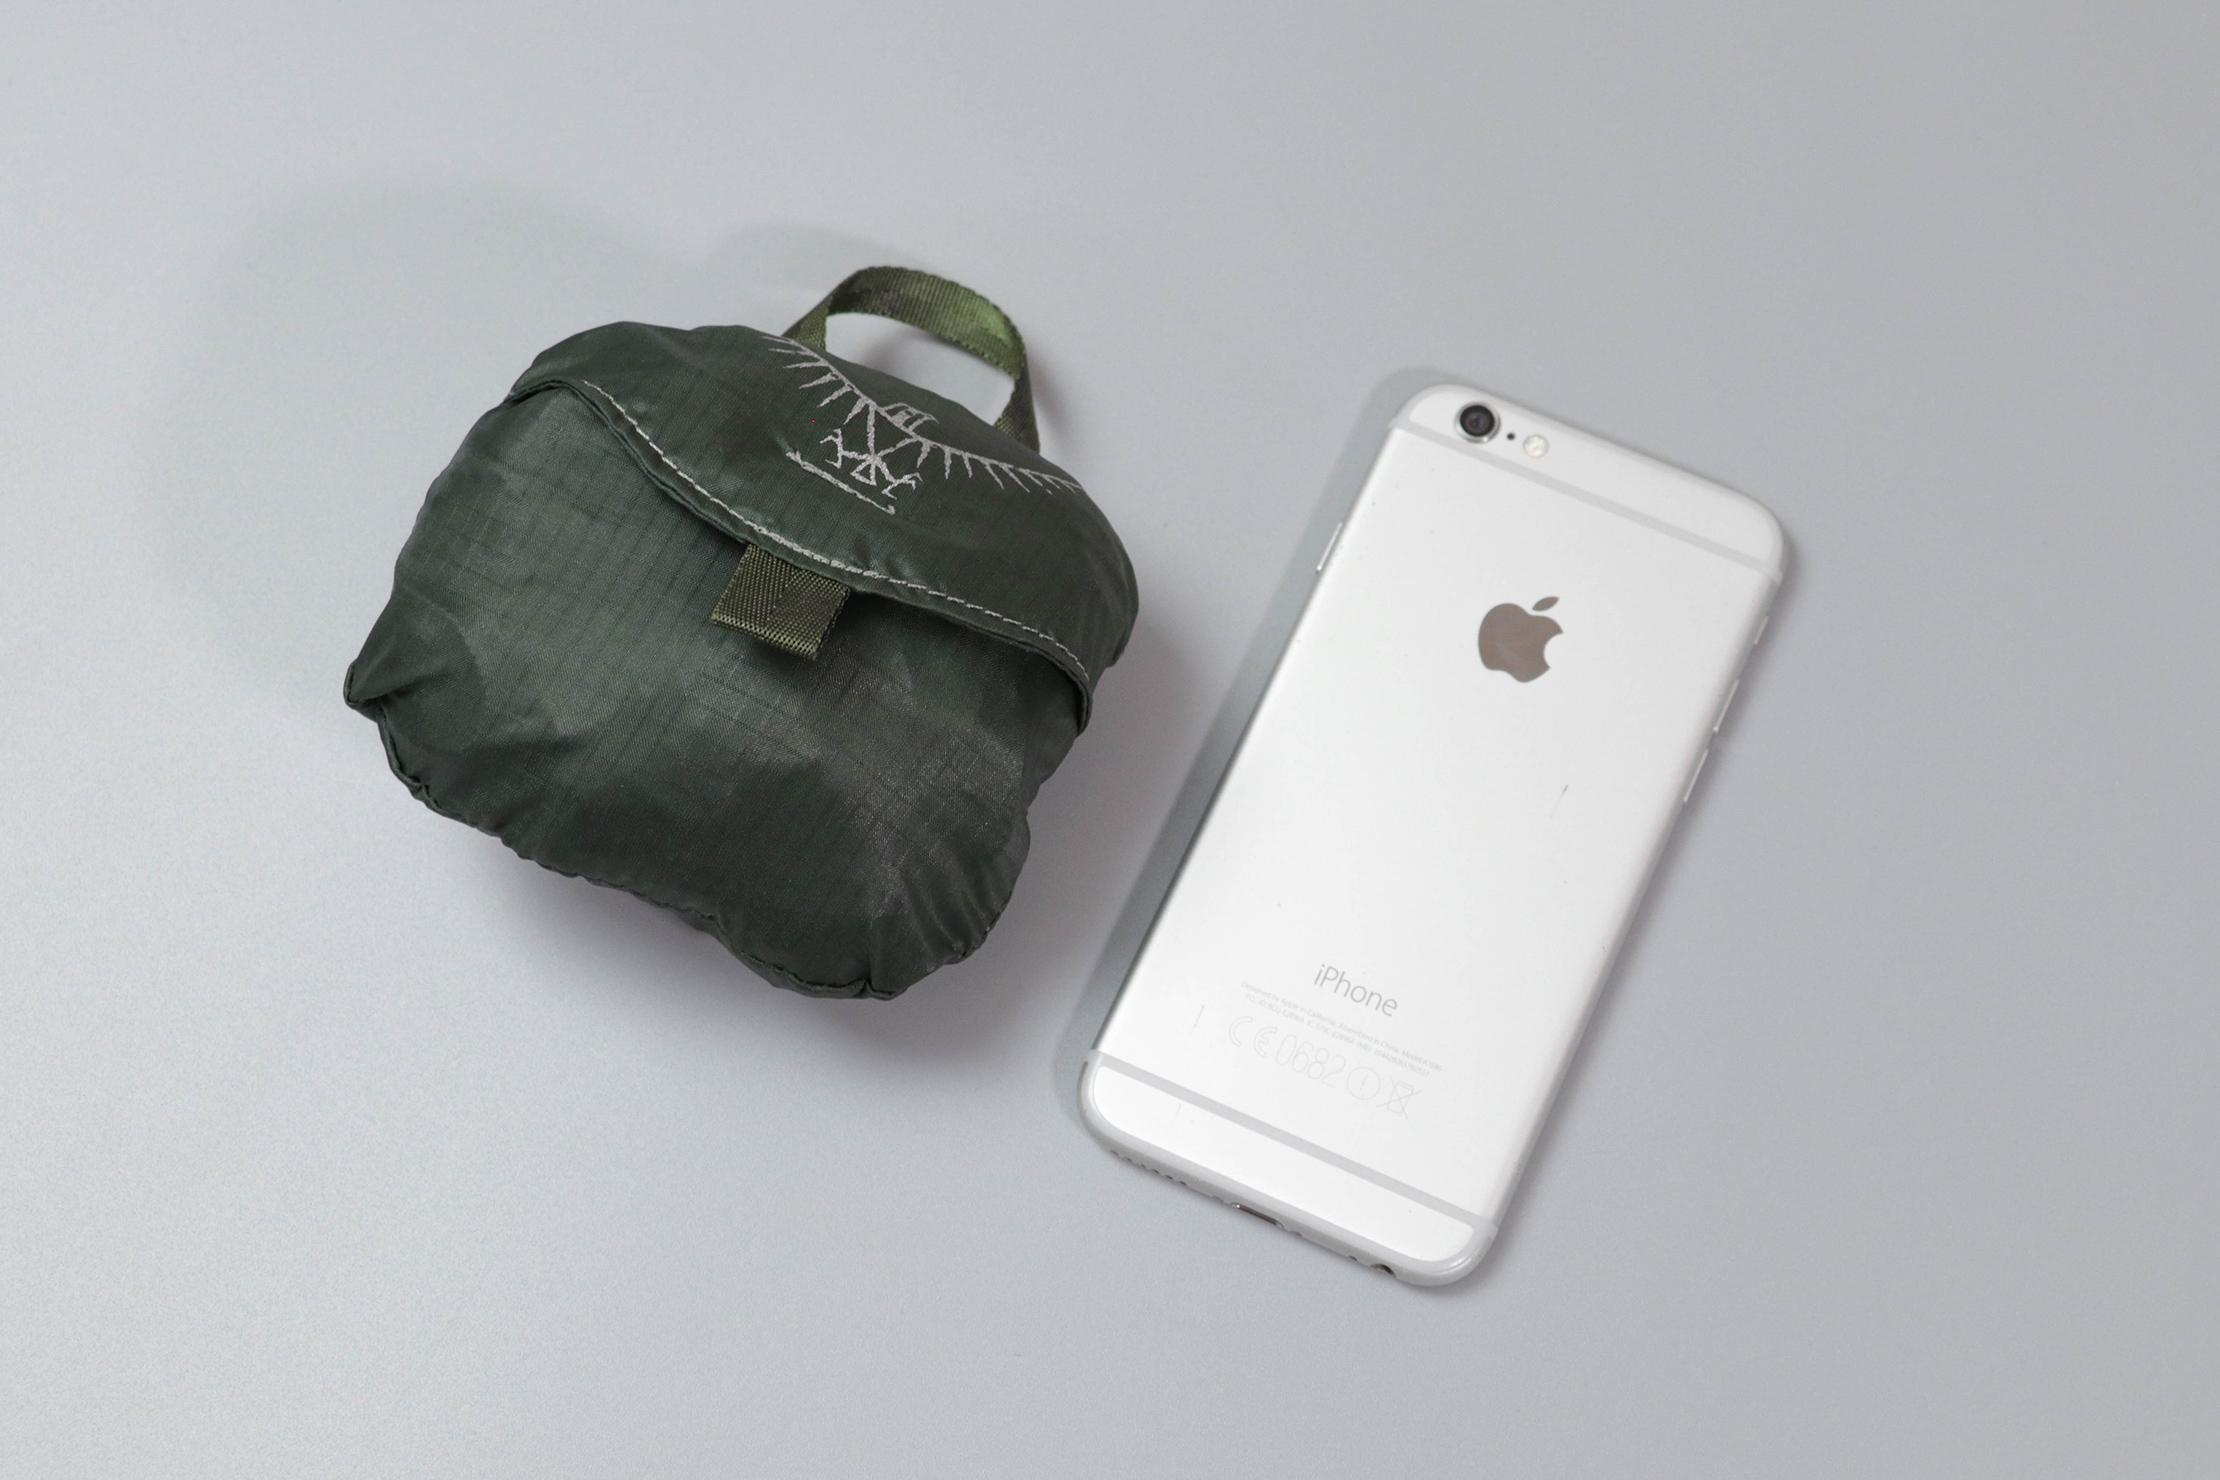 Osprey Ultralight Stuff Pack Stuffed With Phone